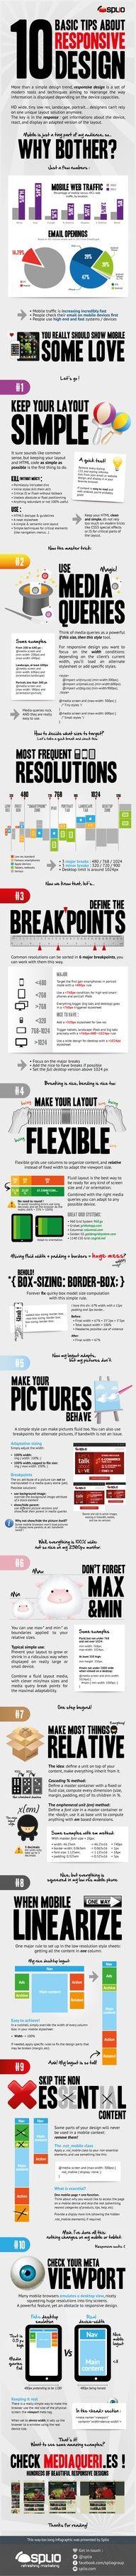 10 Basic Tips About Responsive #Design #infographic #socialmedia http://hepcatsmarketing.com/